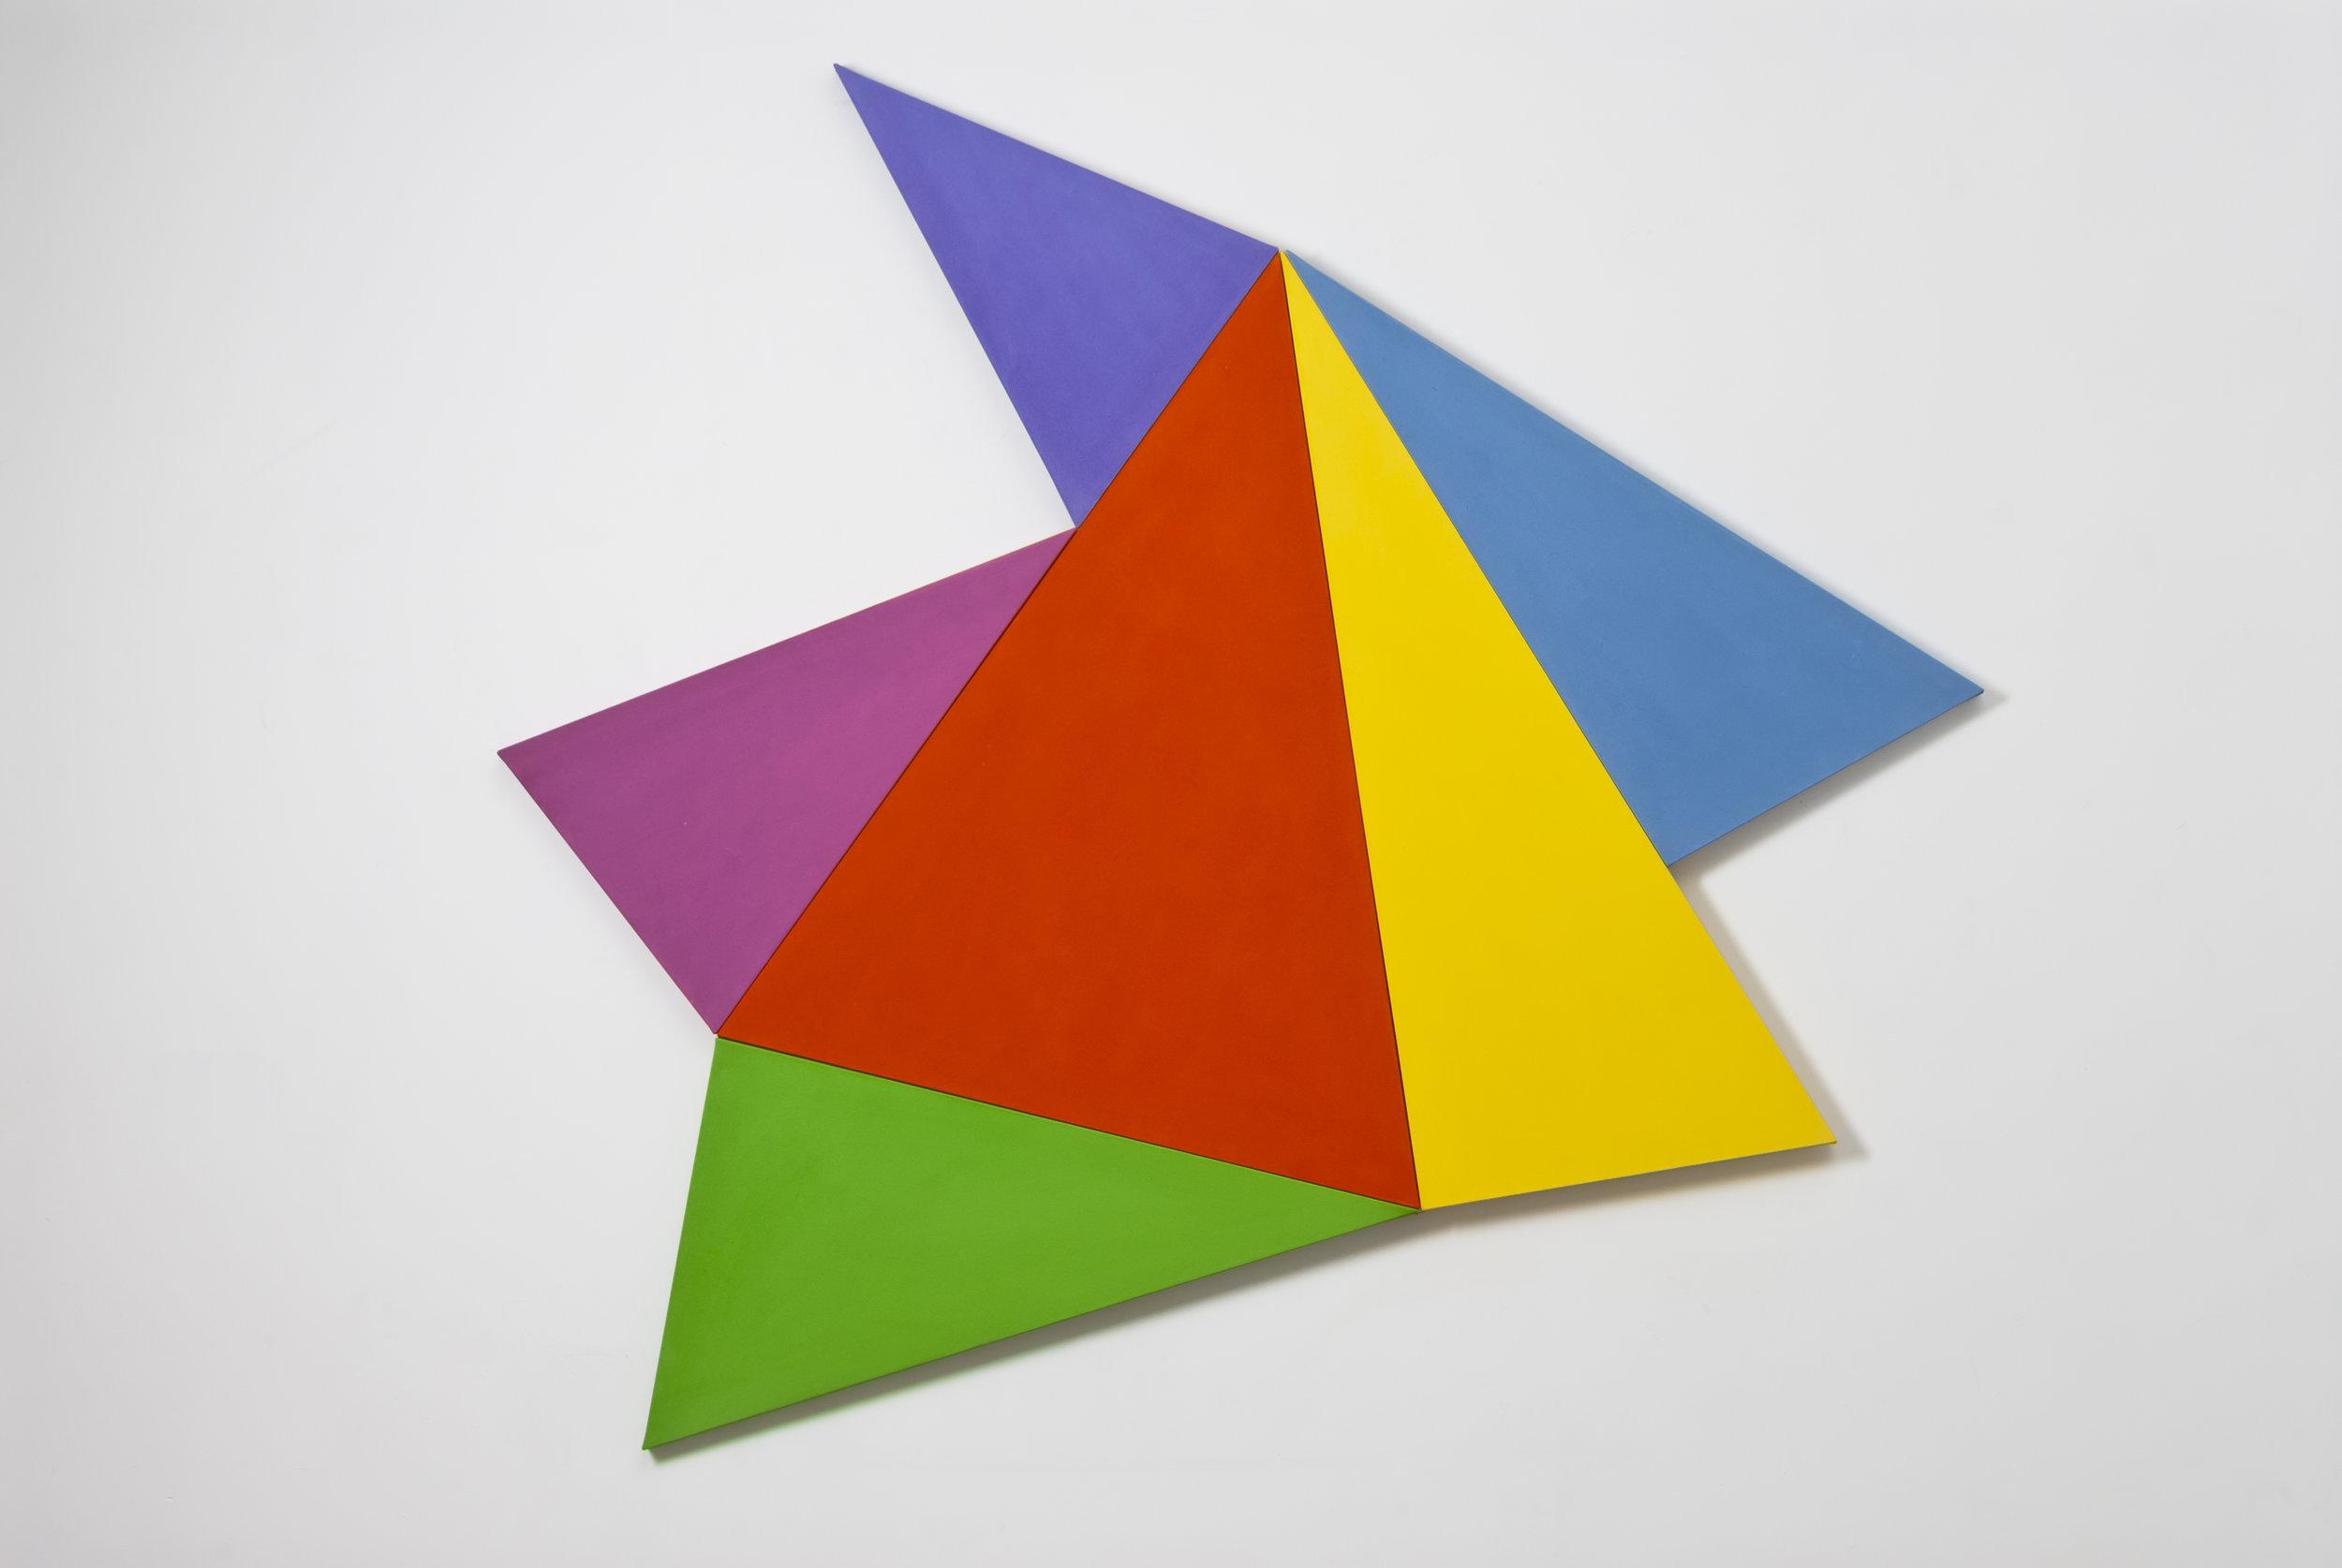 Infinex #38 , 2014, acrylic on canvas, 177.5 x 188.5 cm.